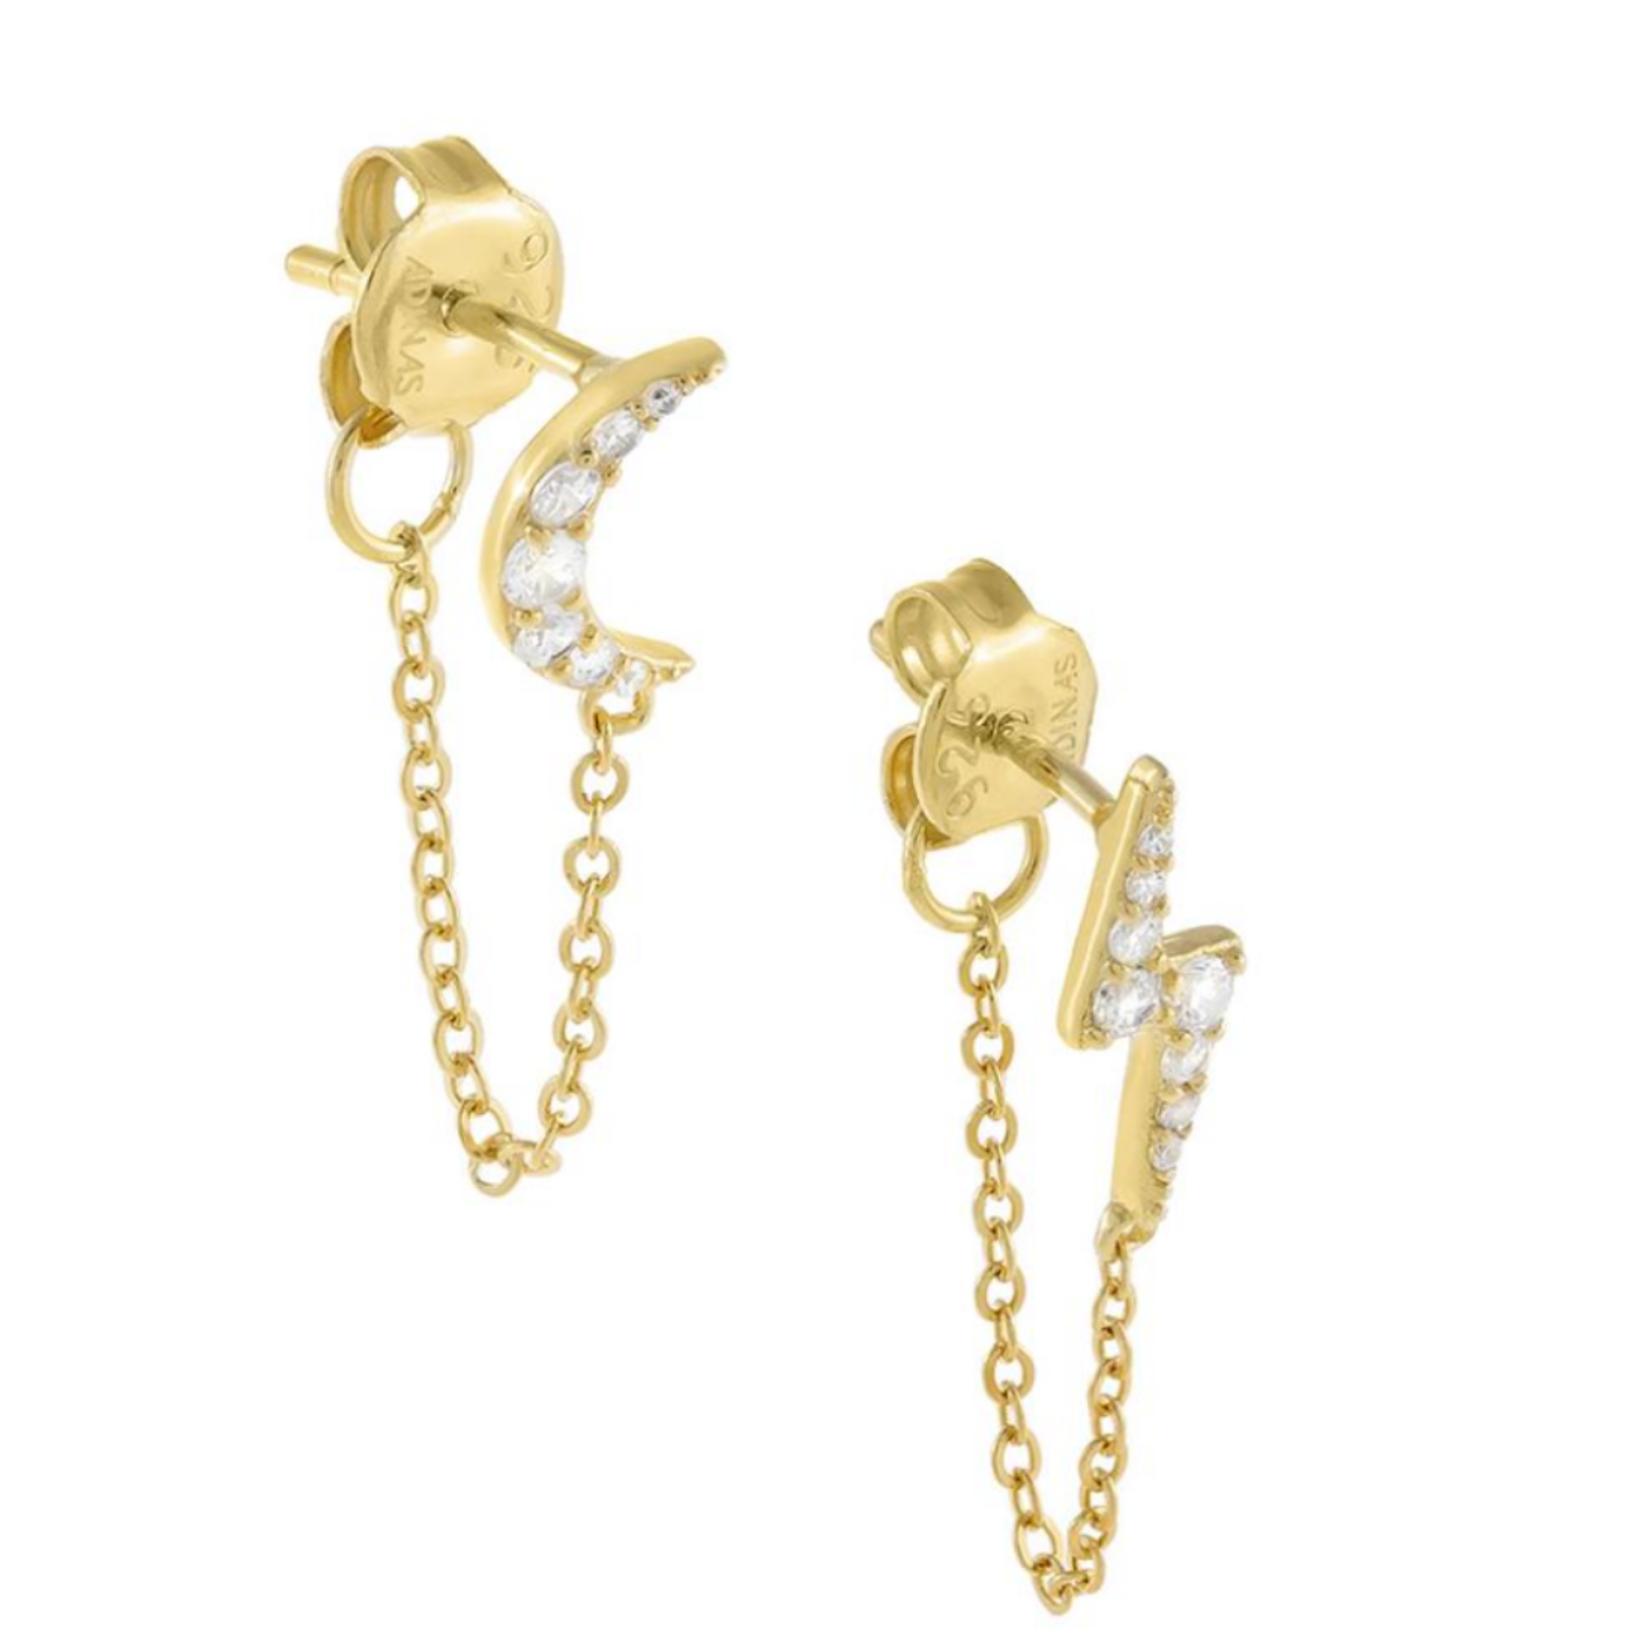 Adinas Pave Celestial Chain Stud Earrings